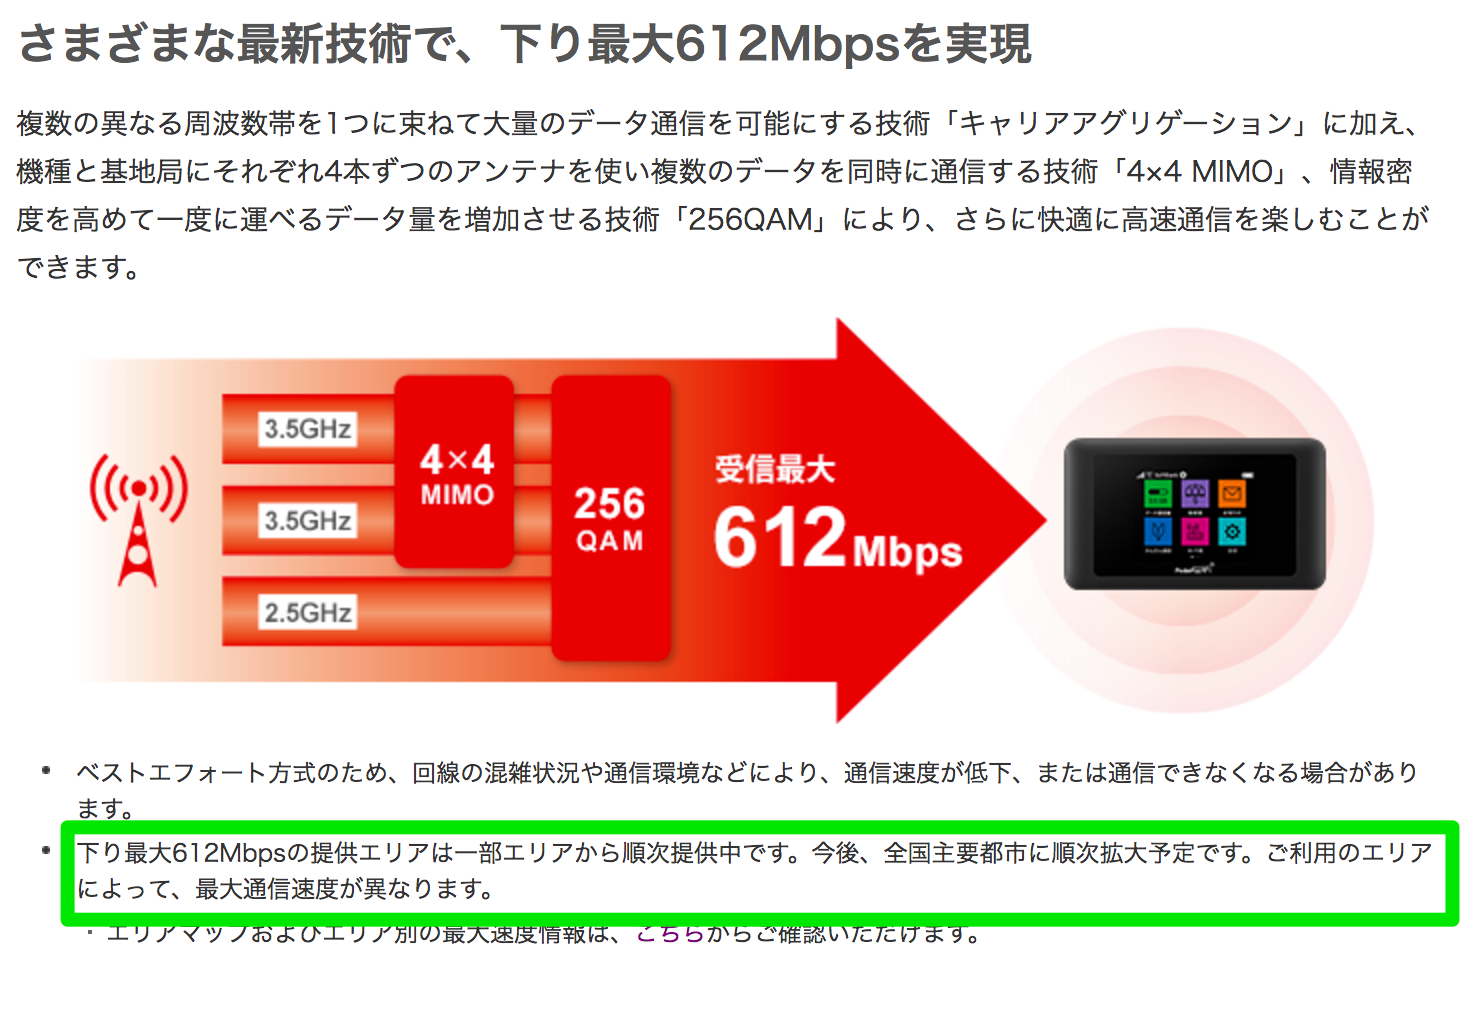 SoftBank_ポケットWiFi_通信速度612Mbps